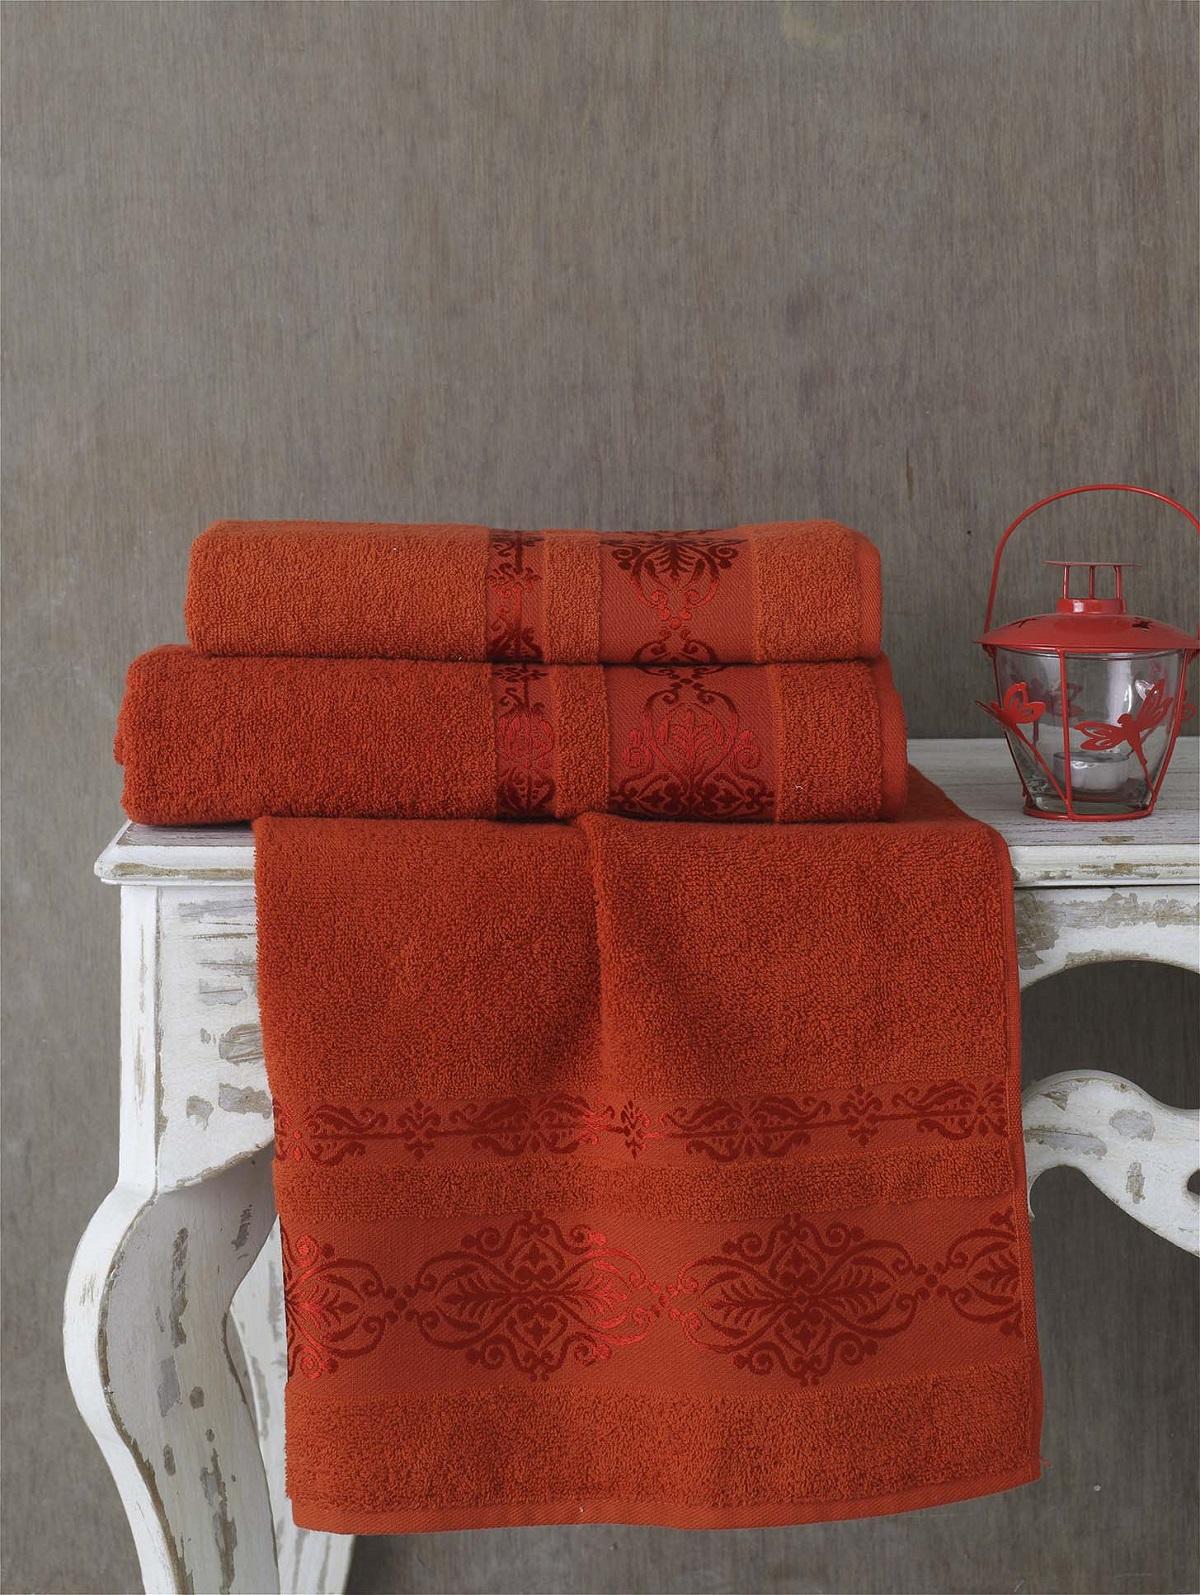 Полотенца Karna Полотенце Rebeka Цвет: Кирпичный (70х140 см) полотенца karna полотенце iteka цвет коричневый 70х140 см